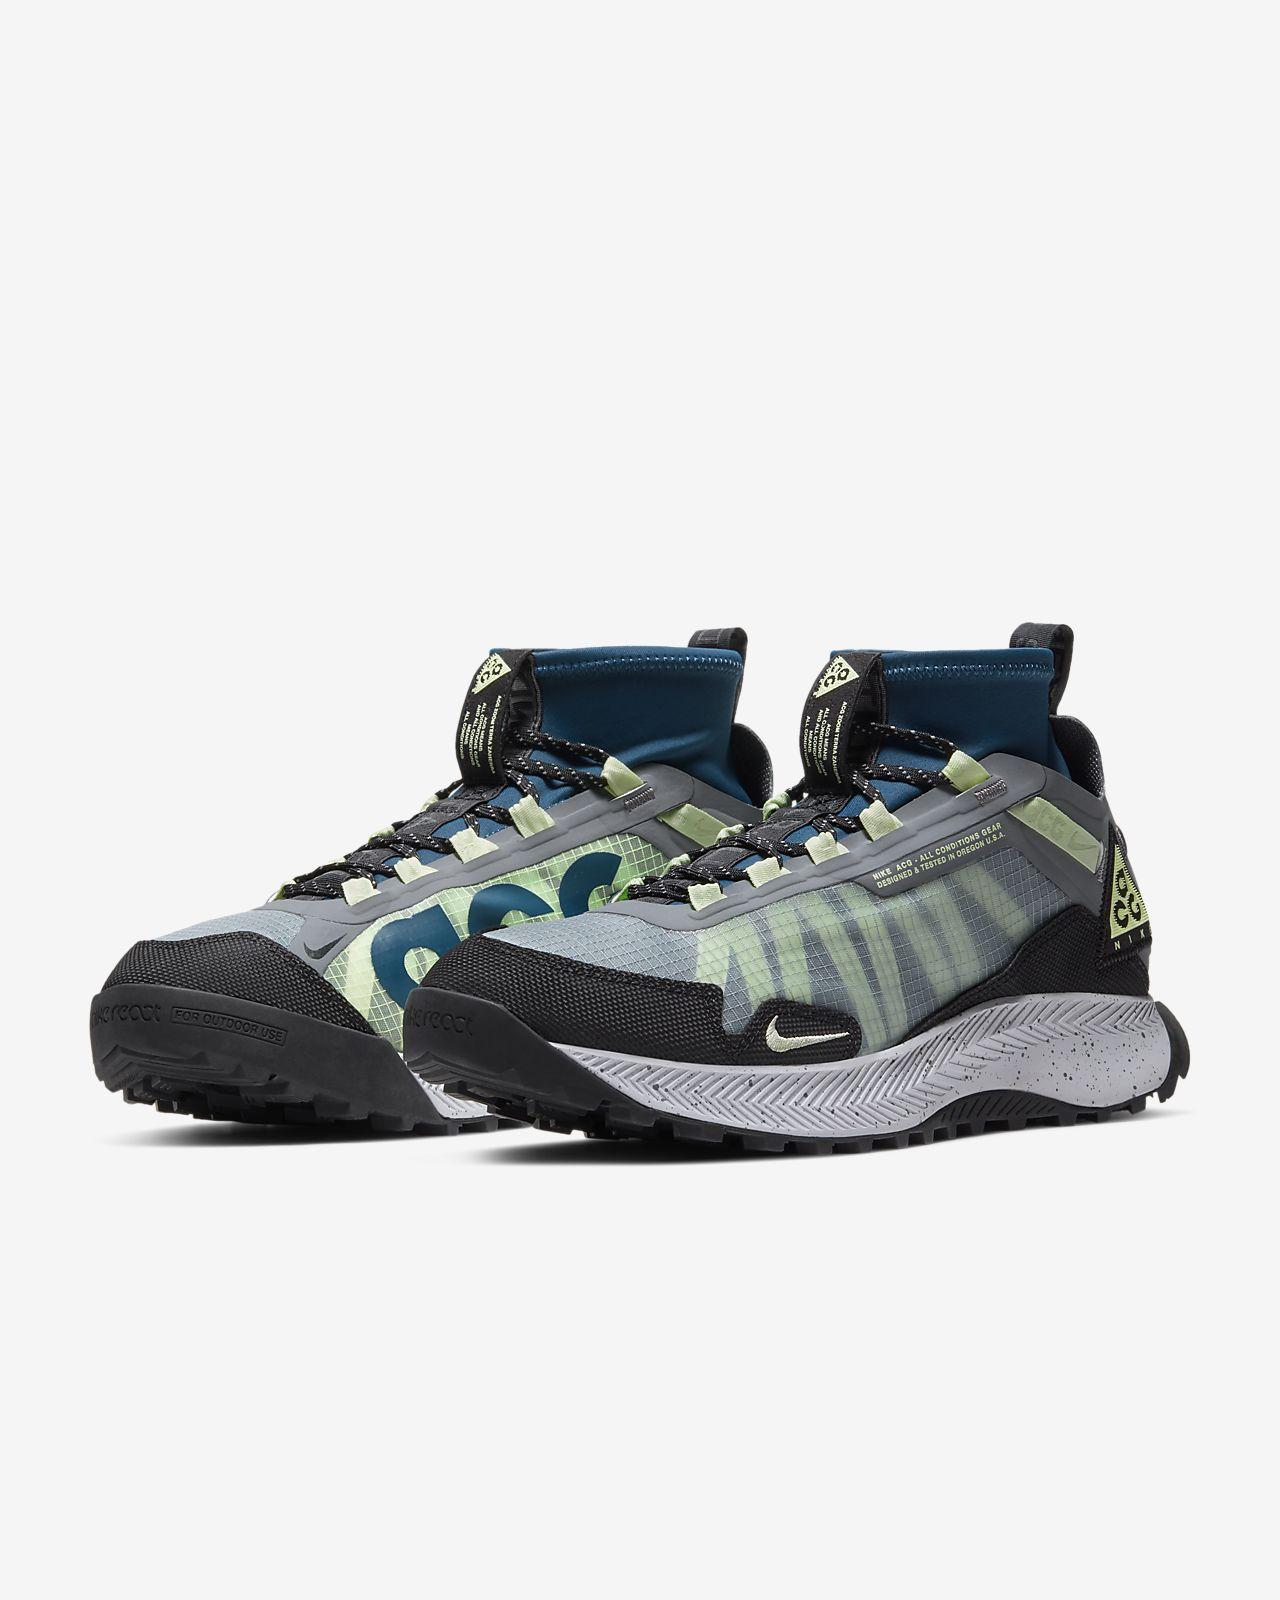 Chaussure Nike ACG Zoom Terra Zaherra pour Homme